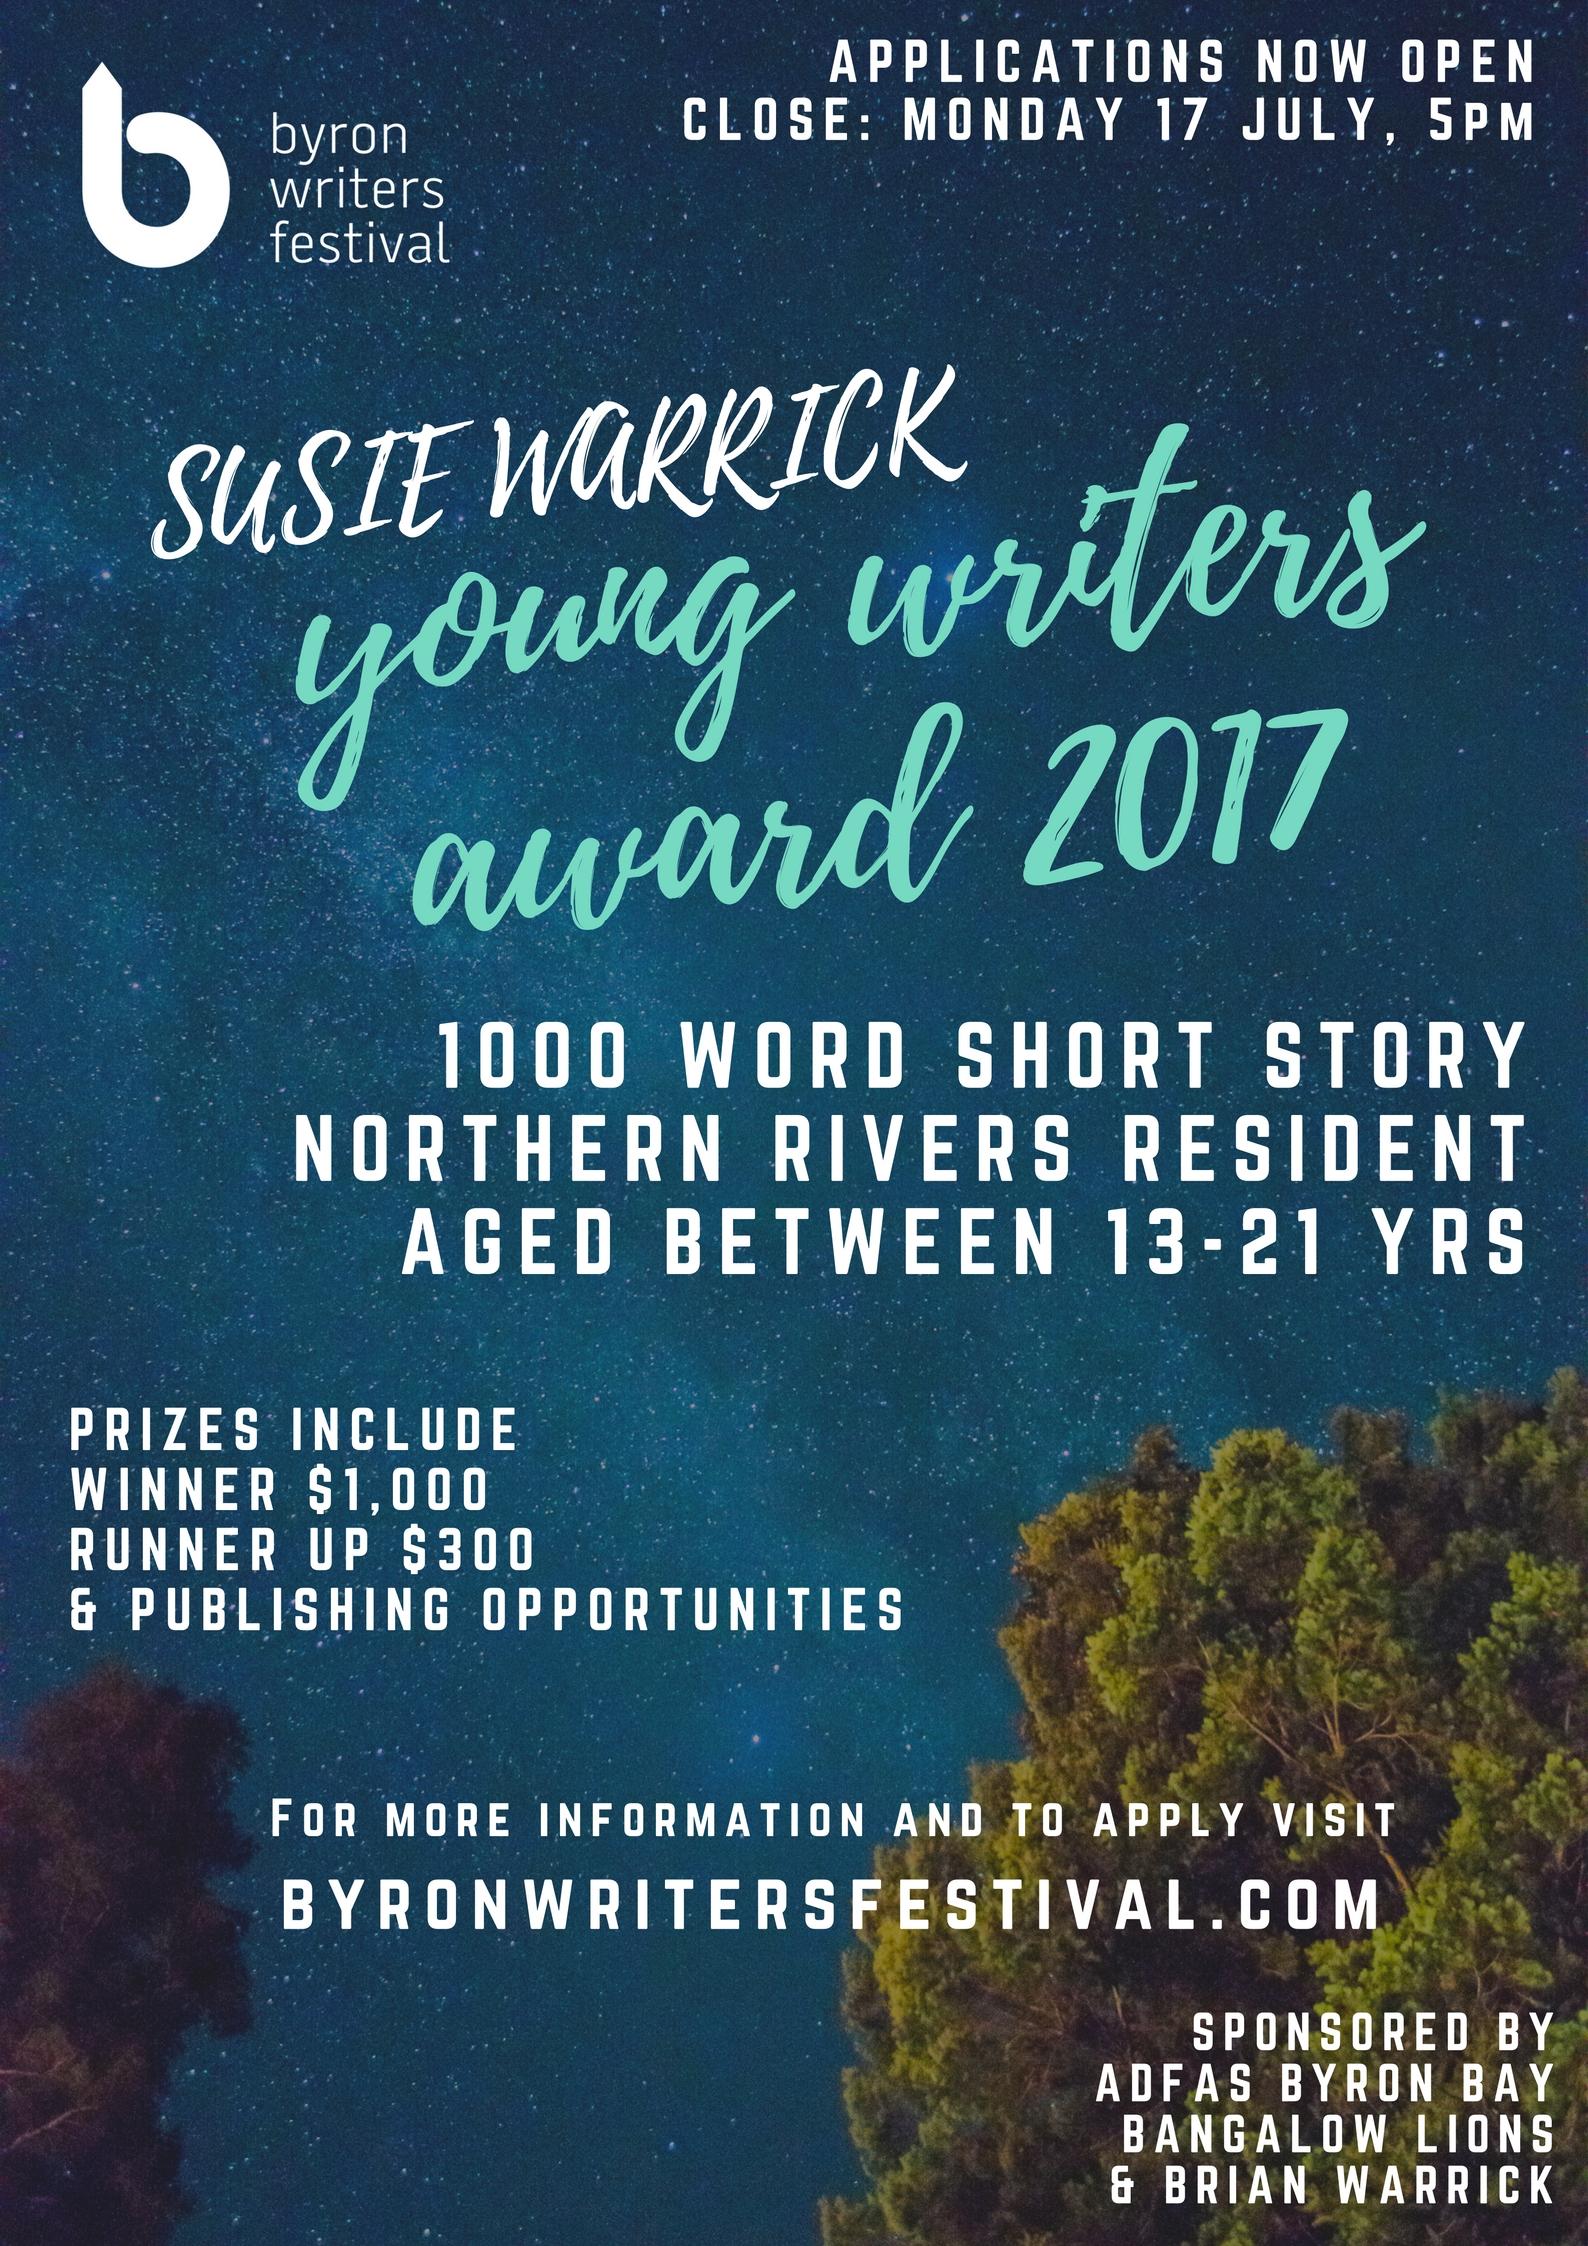 https://byronwritersfestival.com/wp-content/uploads/2016/05/SUSIE-WARRICK.jpg